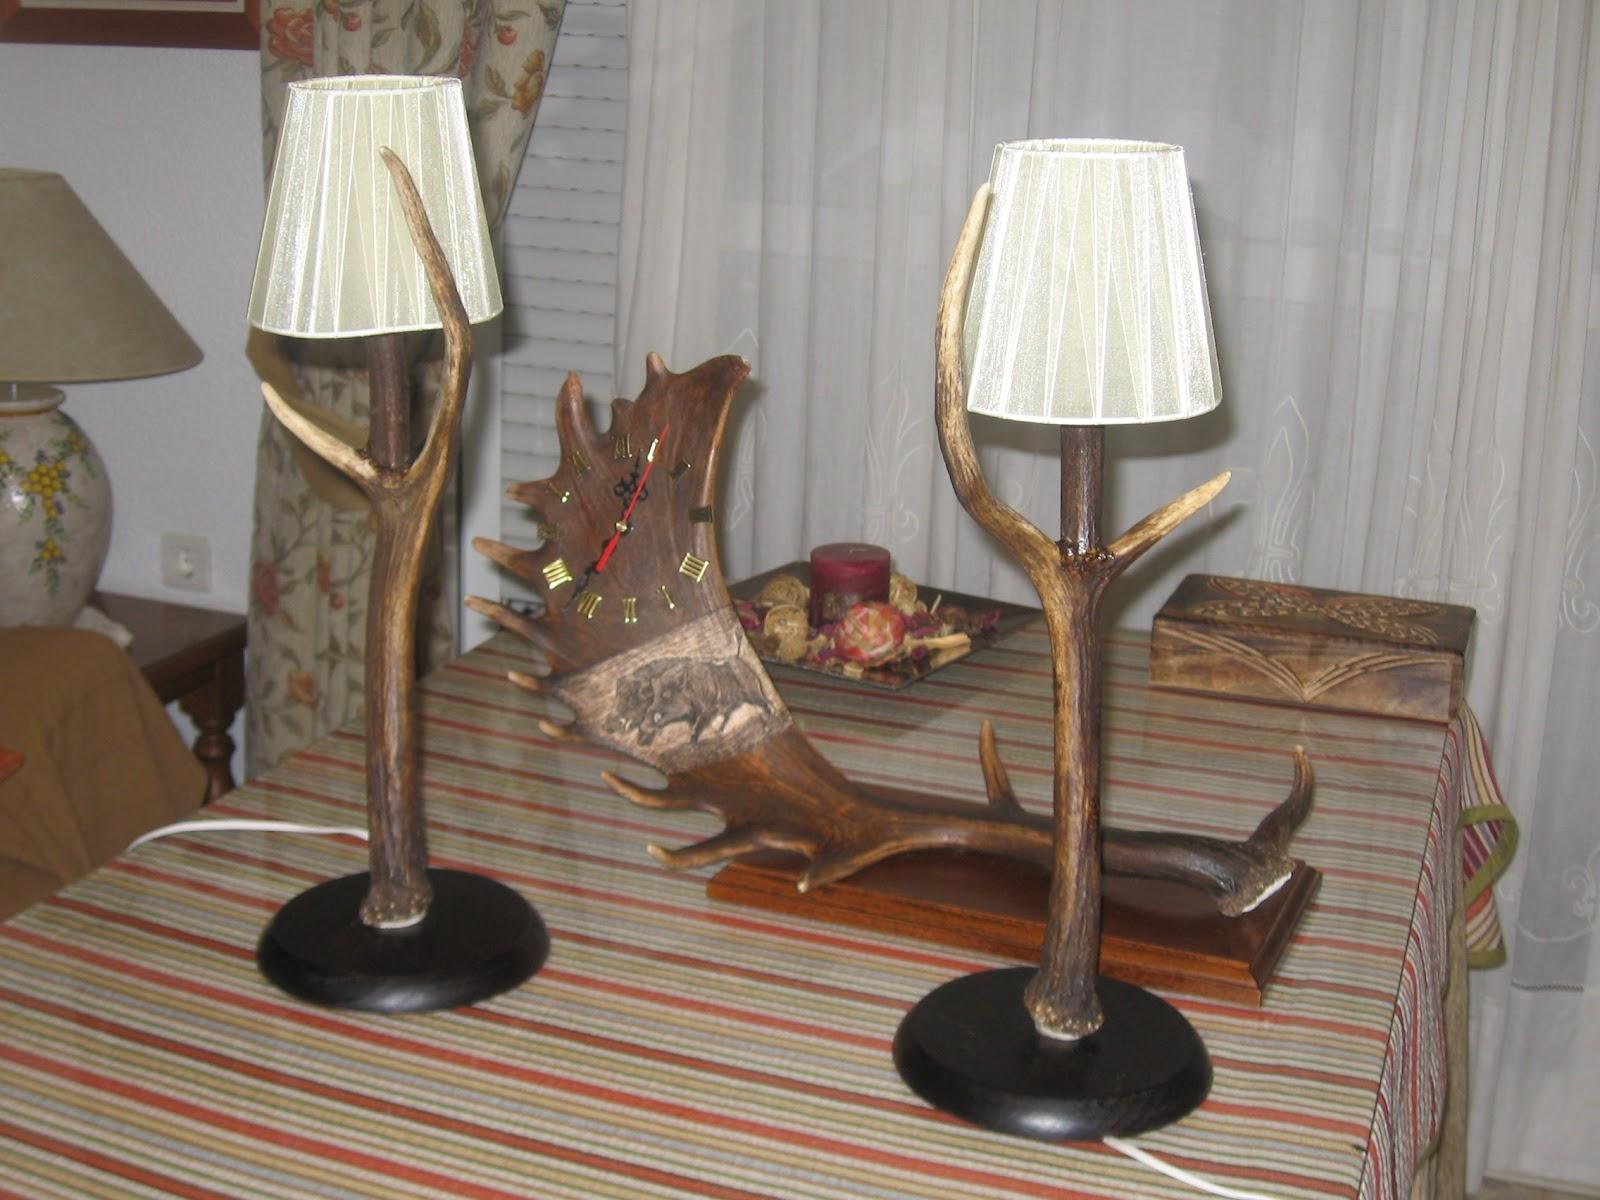 Arte cineg tico carol lamparas para mesitas de noche - Lamparas para mesitas ...